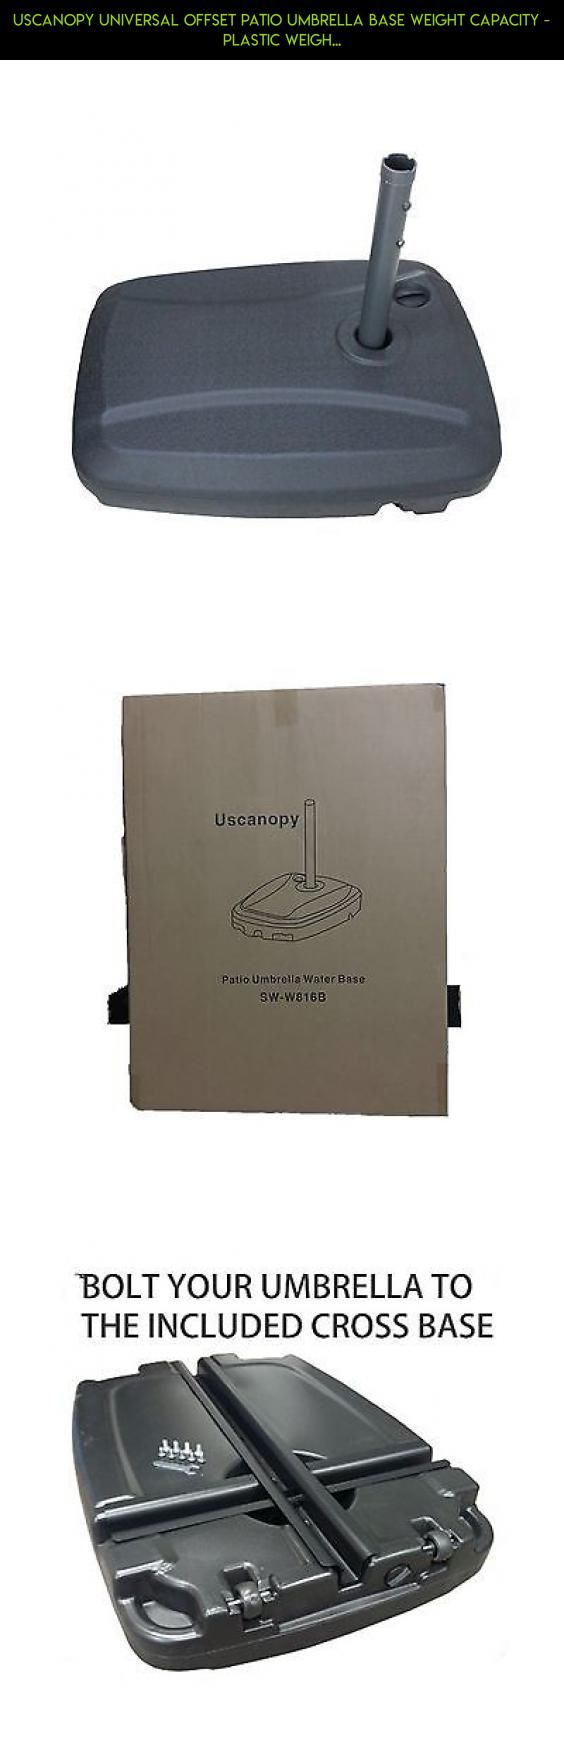 Uscanopy Universal Offset Patio Umbrella Base Weight Capacity   Plastic  Weigh... #technology